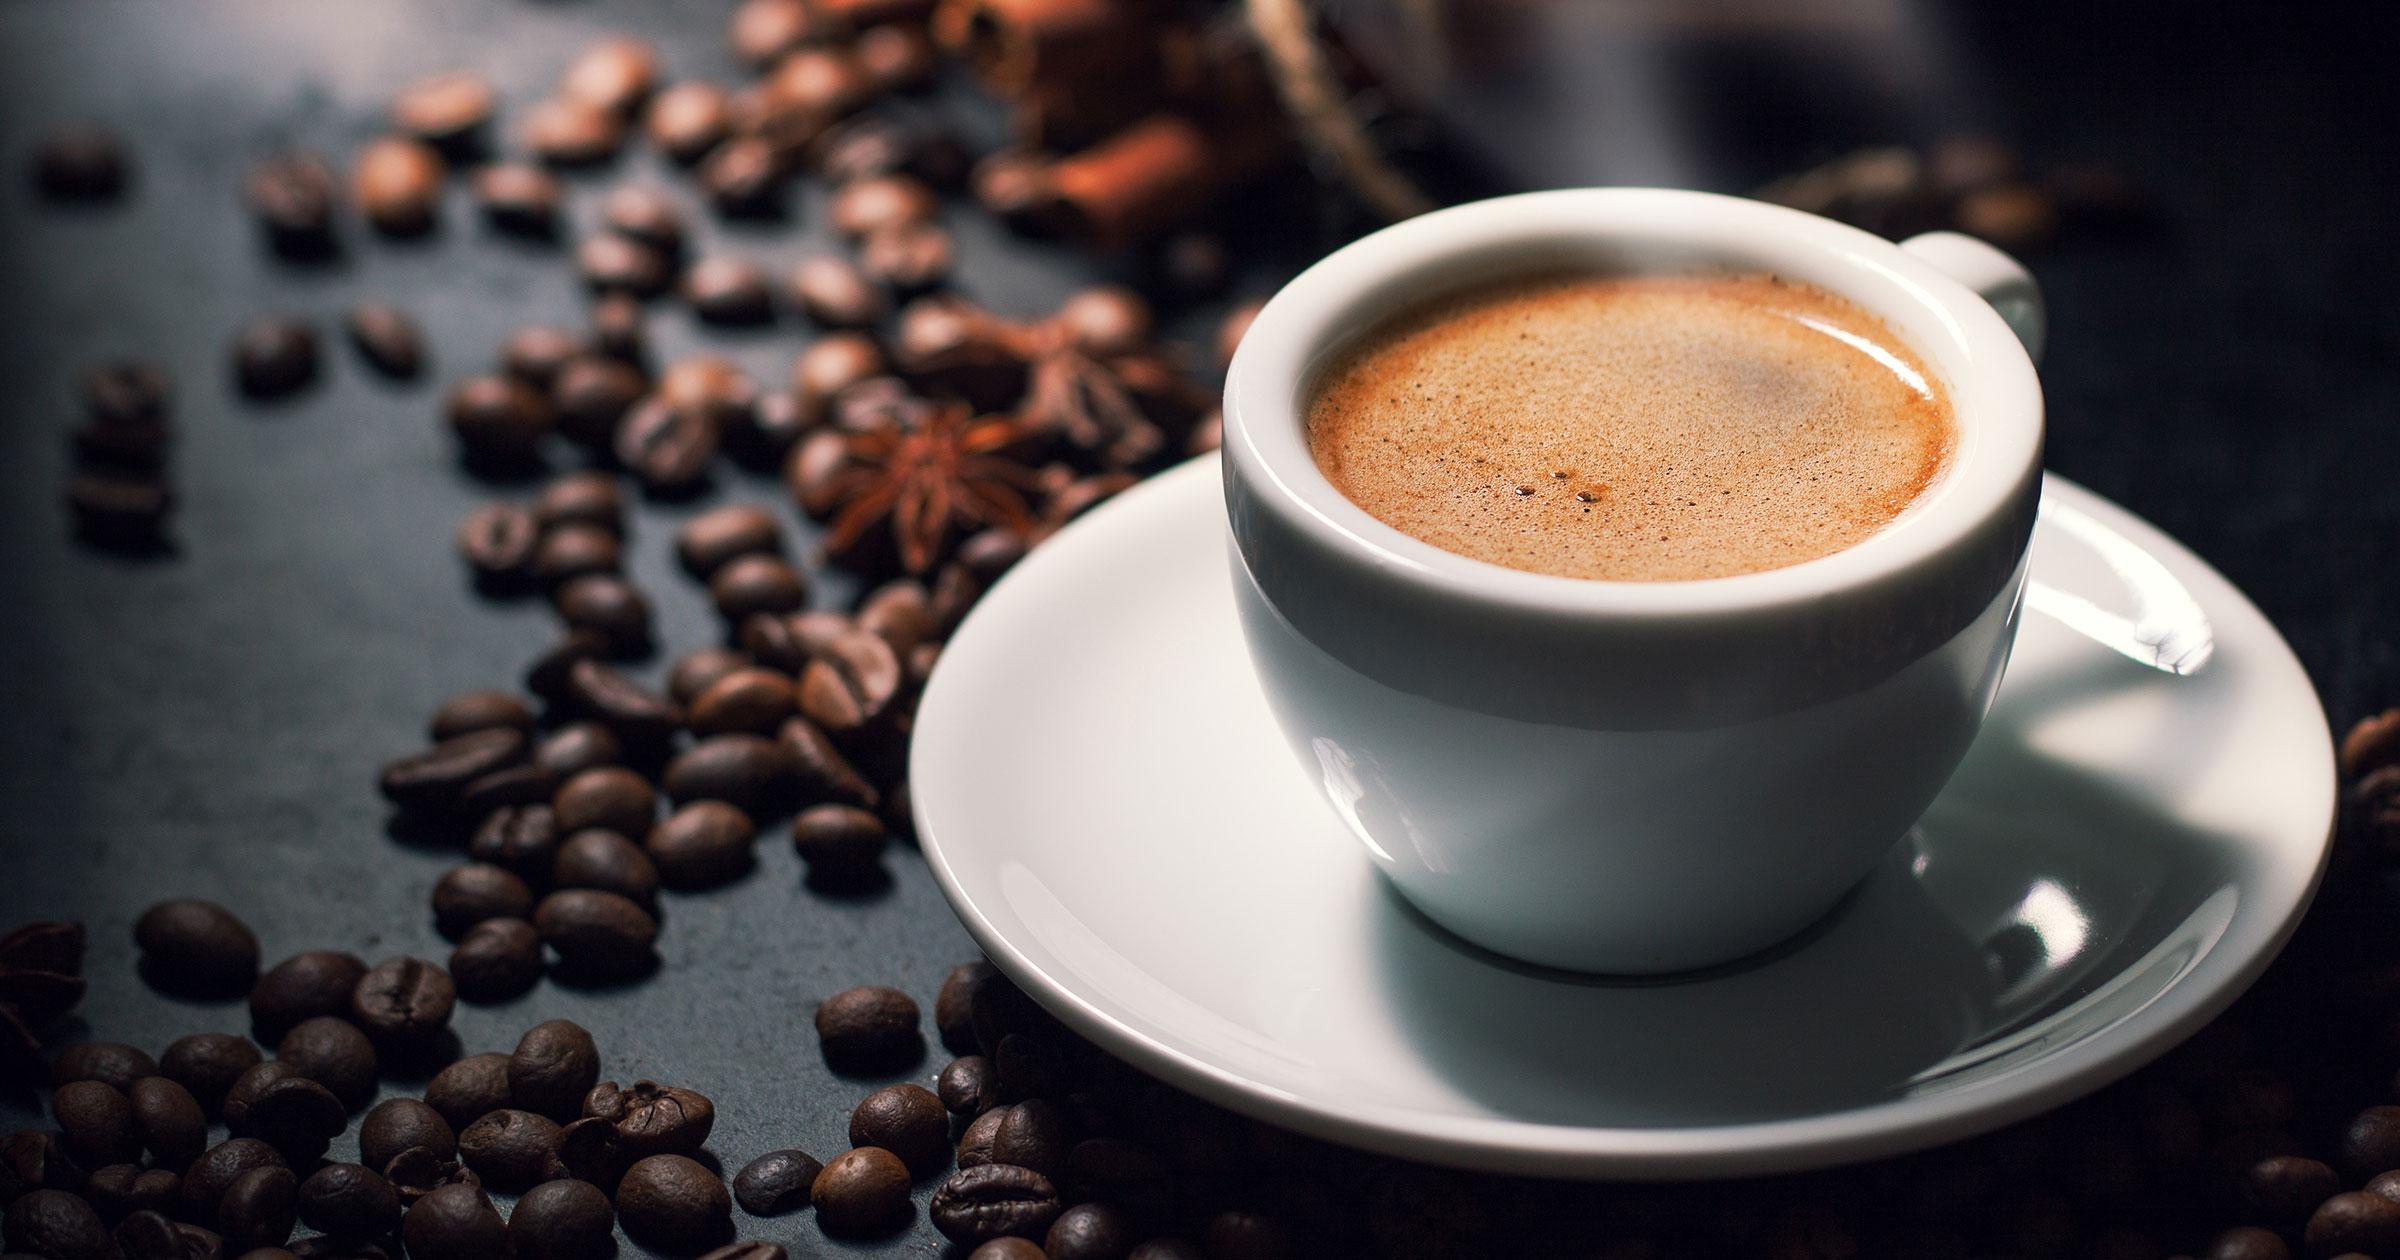 Boulevard coffee